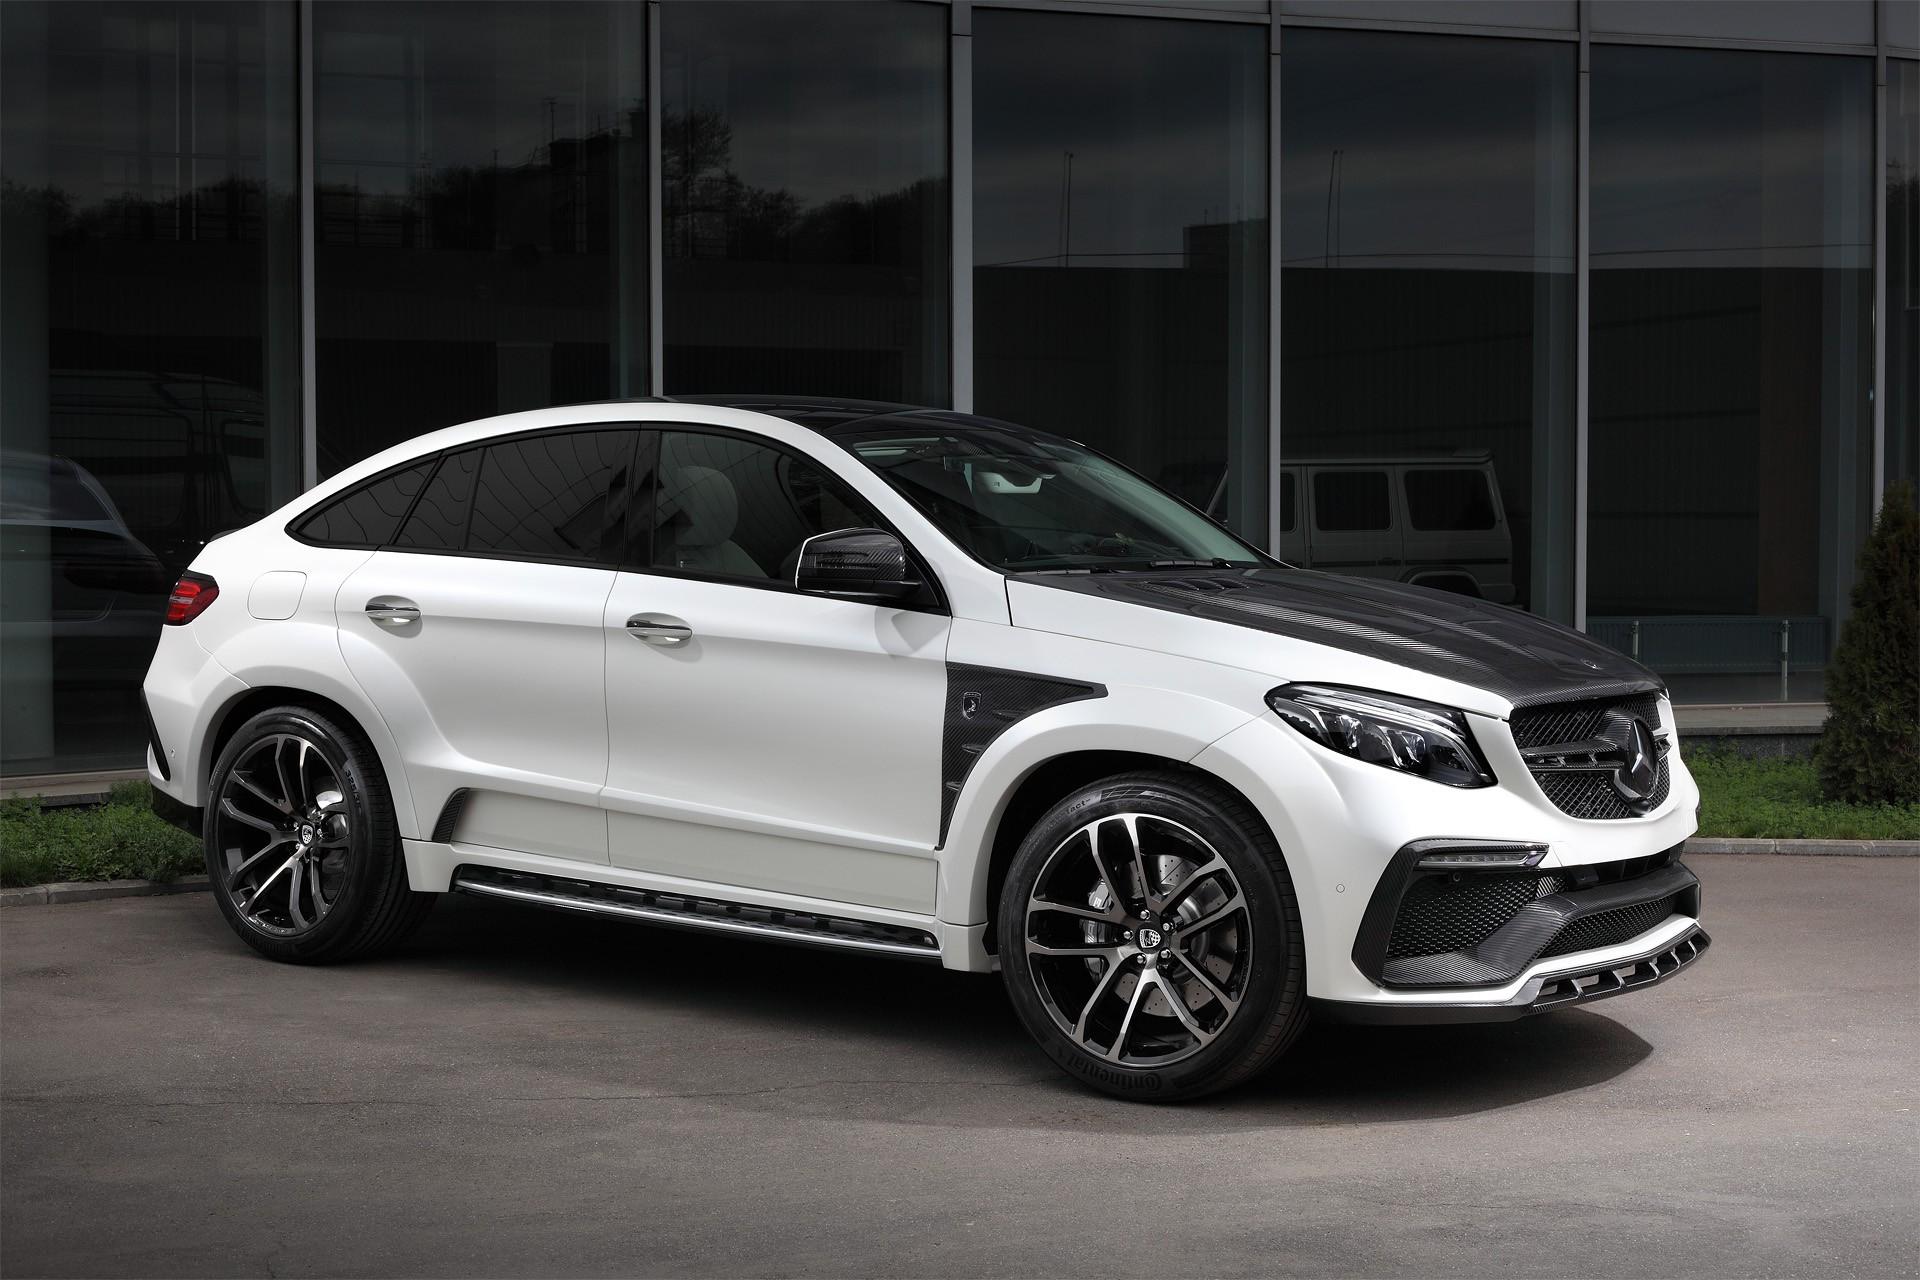 Mercedes Benz Gle Coupe Inferno Carbon Topcar